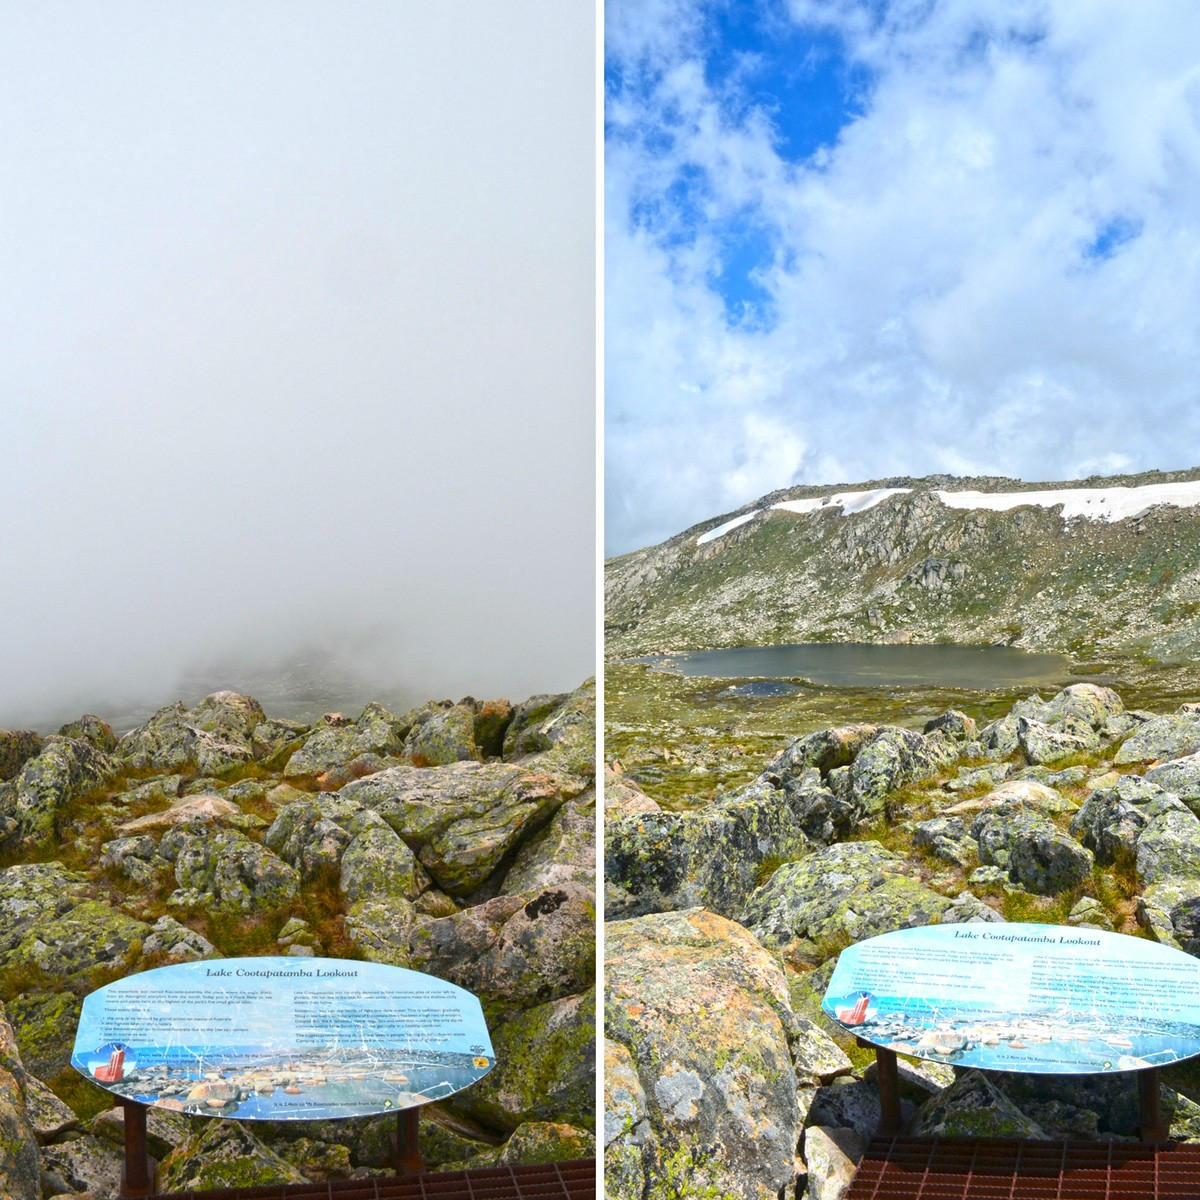 Lake Cootapatamba Lookout - Mount Kosciuszko